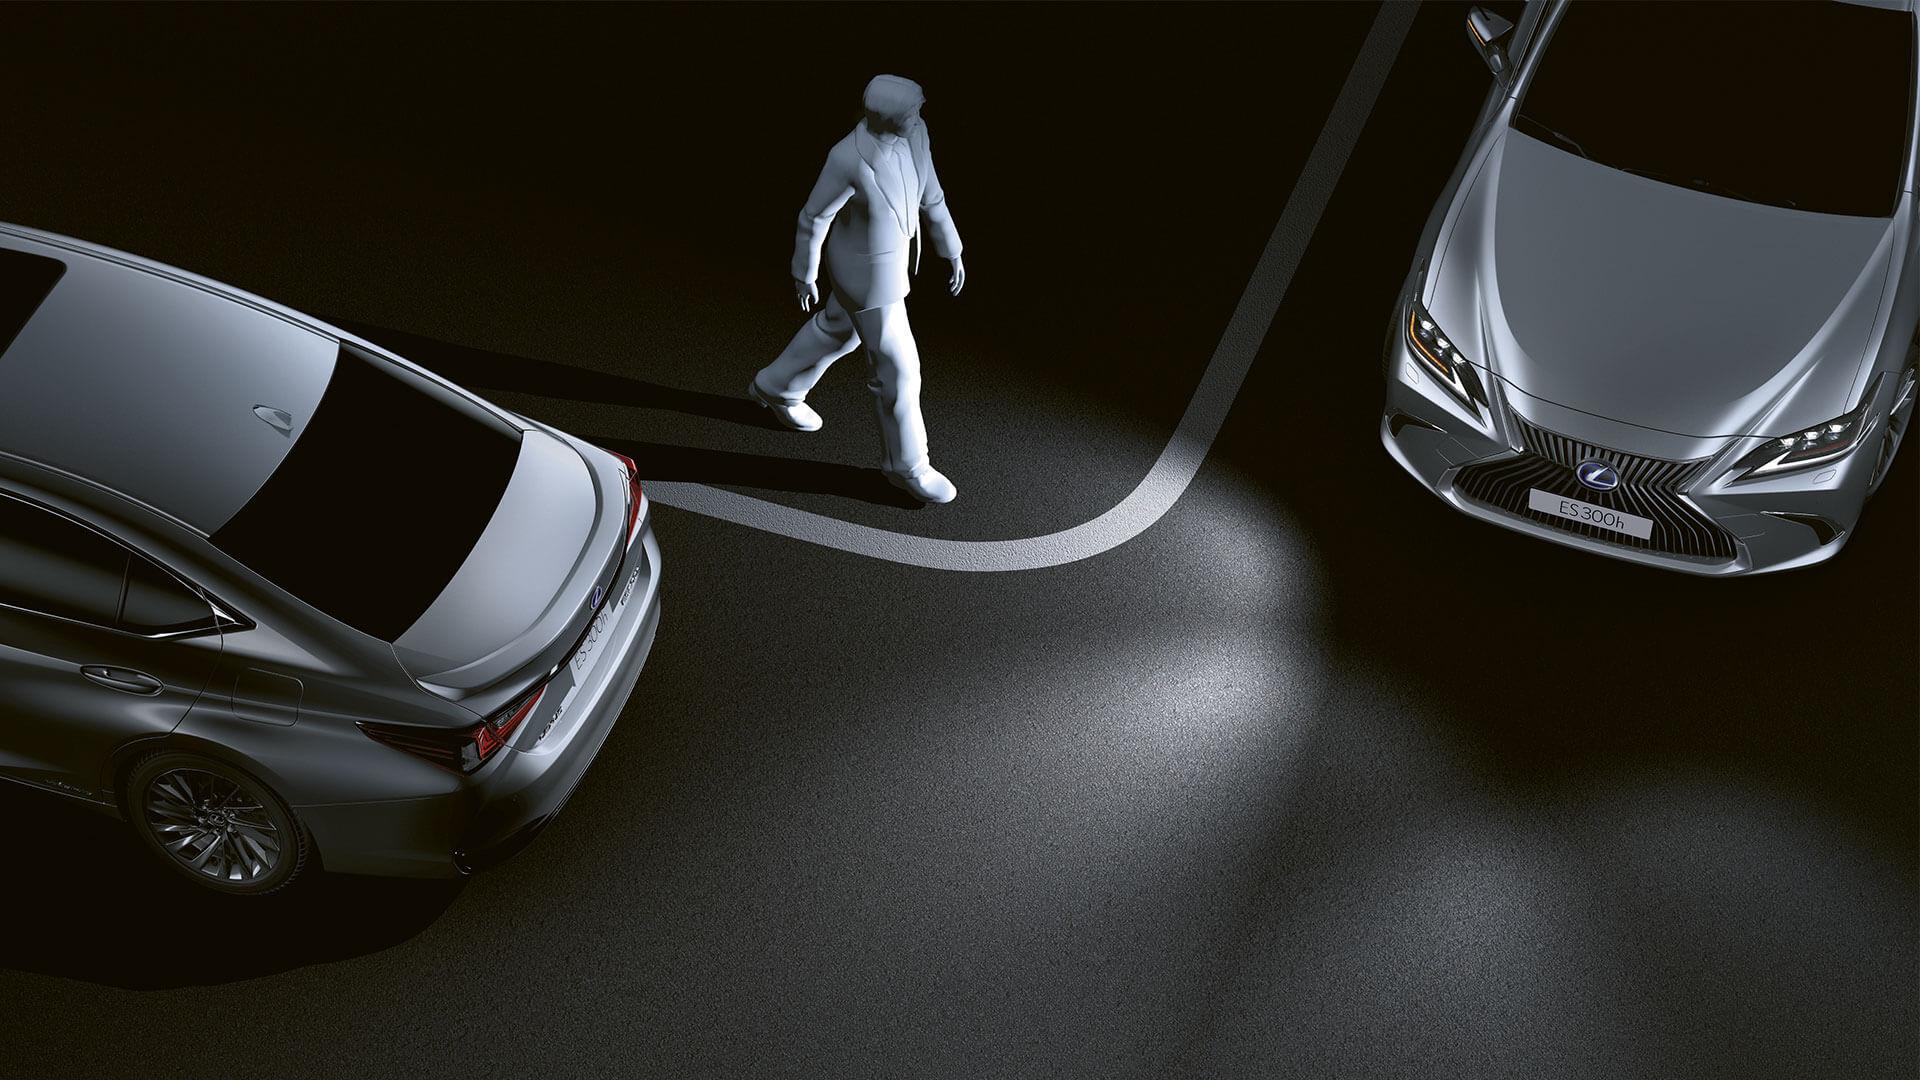 2019 lexus es hybrid experience feature cornering lights